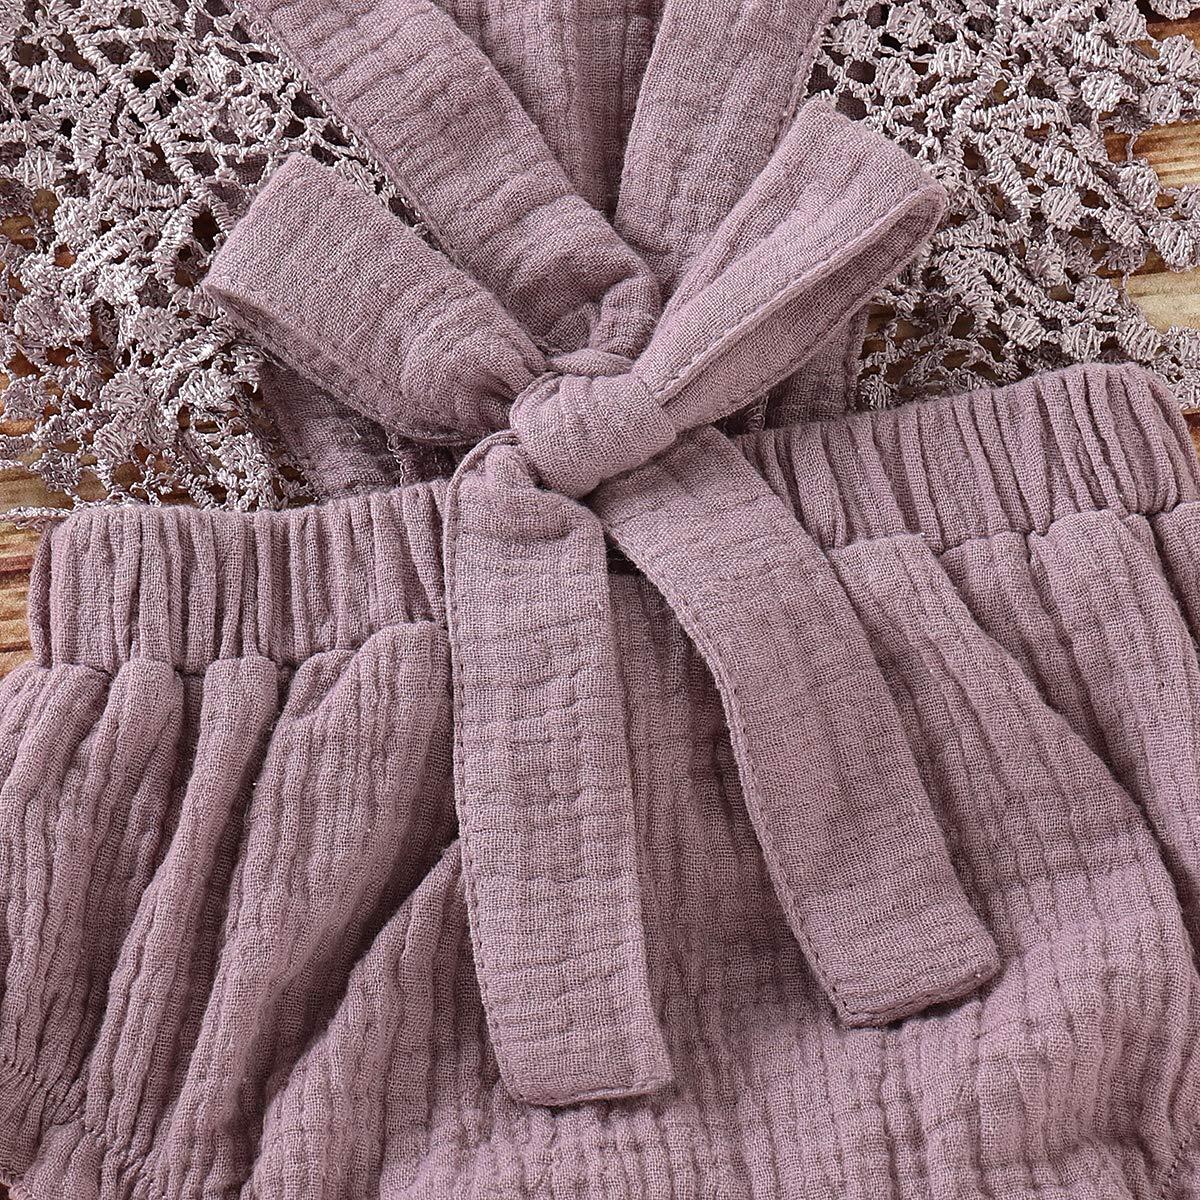 Neugeborenen Sommer /ärmellose Strampler Haokaini Lace Bowknot Bodysuits Sonnenanz/üge Baby R/üschen Overall Outfits